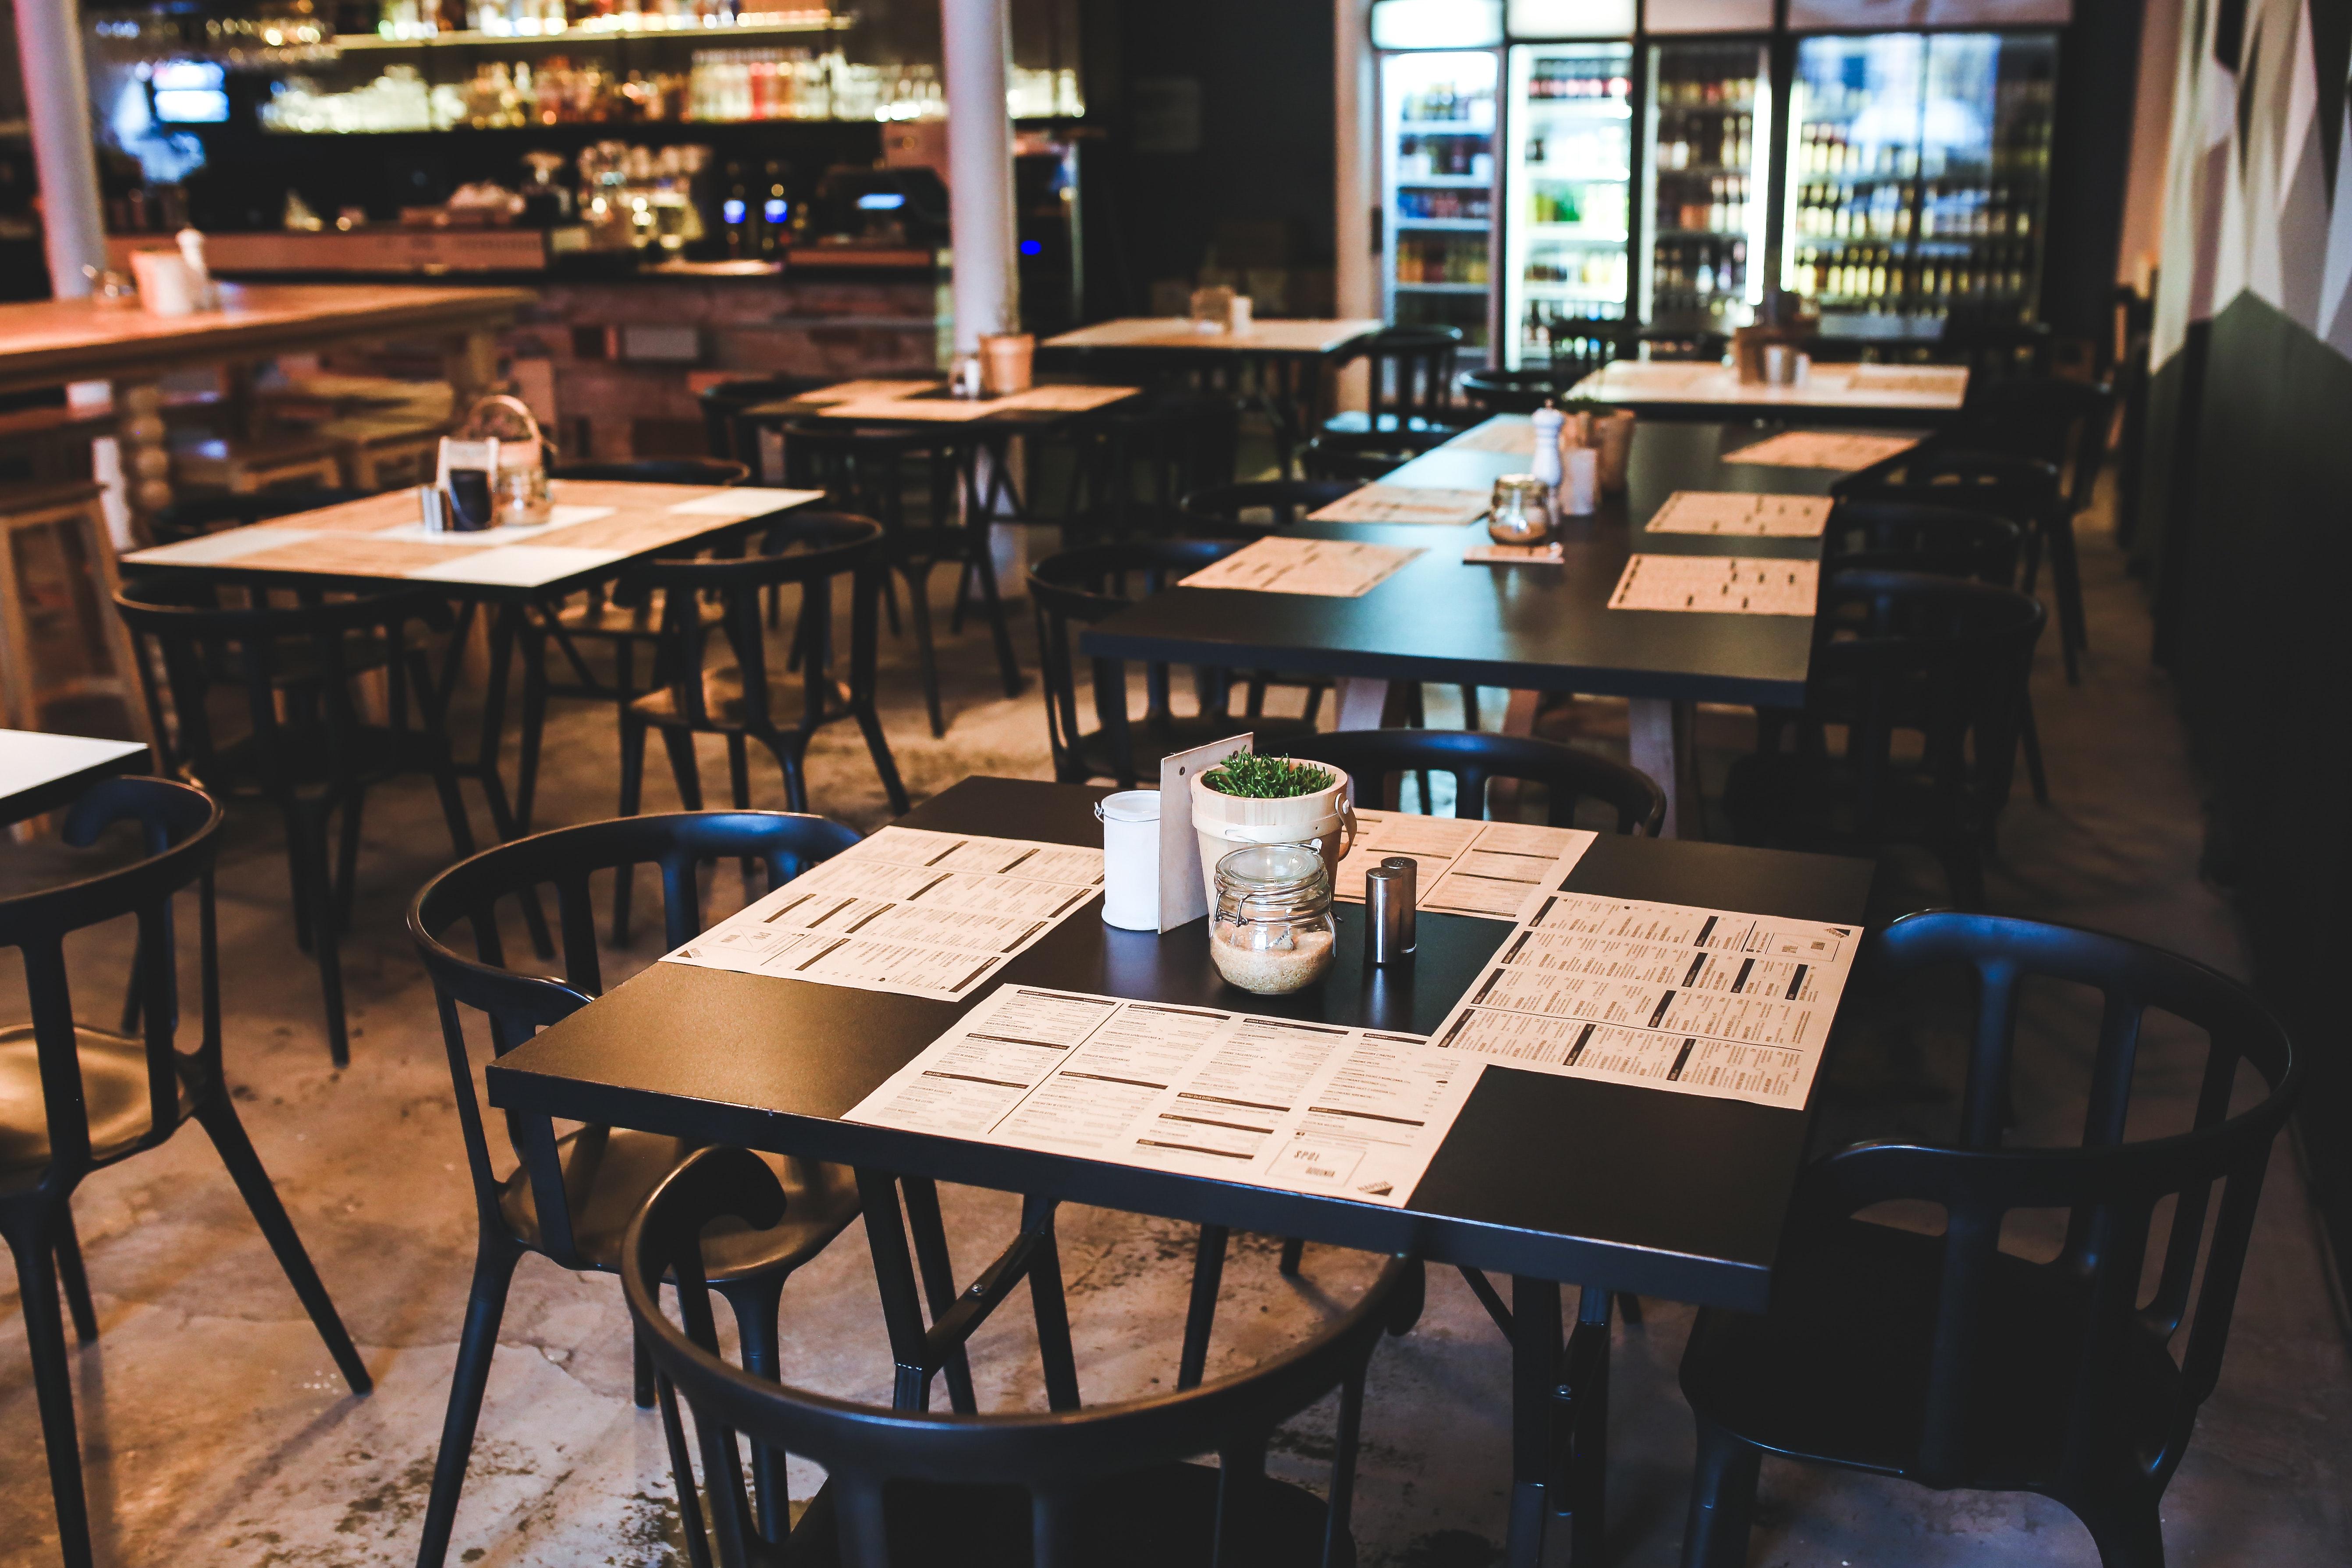 Restaurants Industry Research